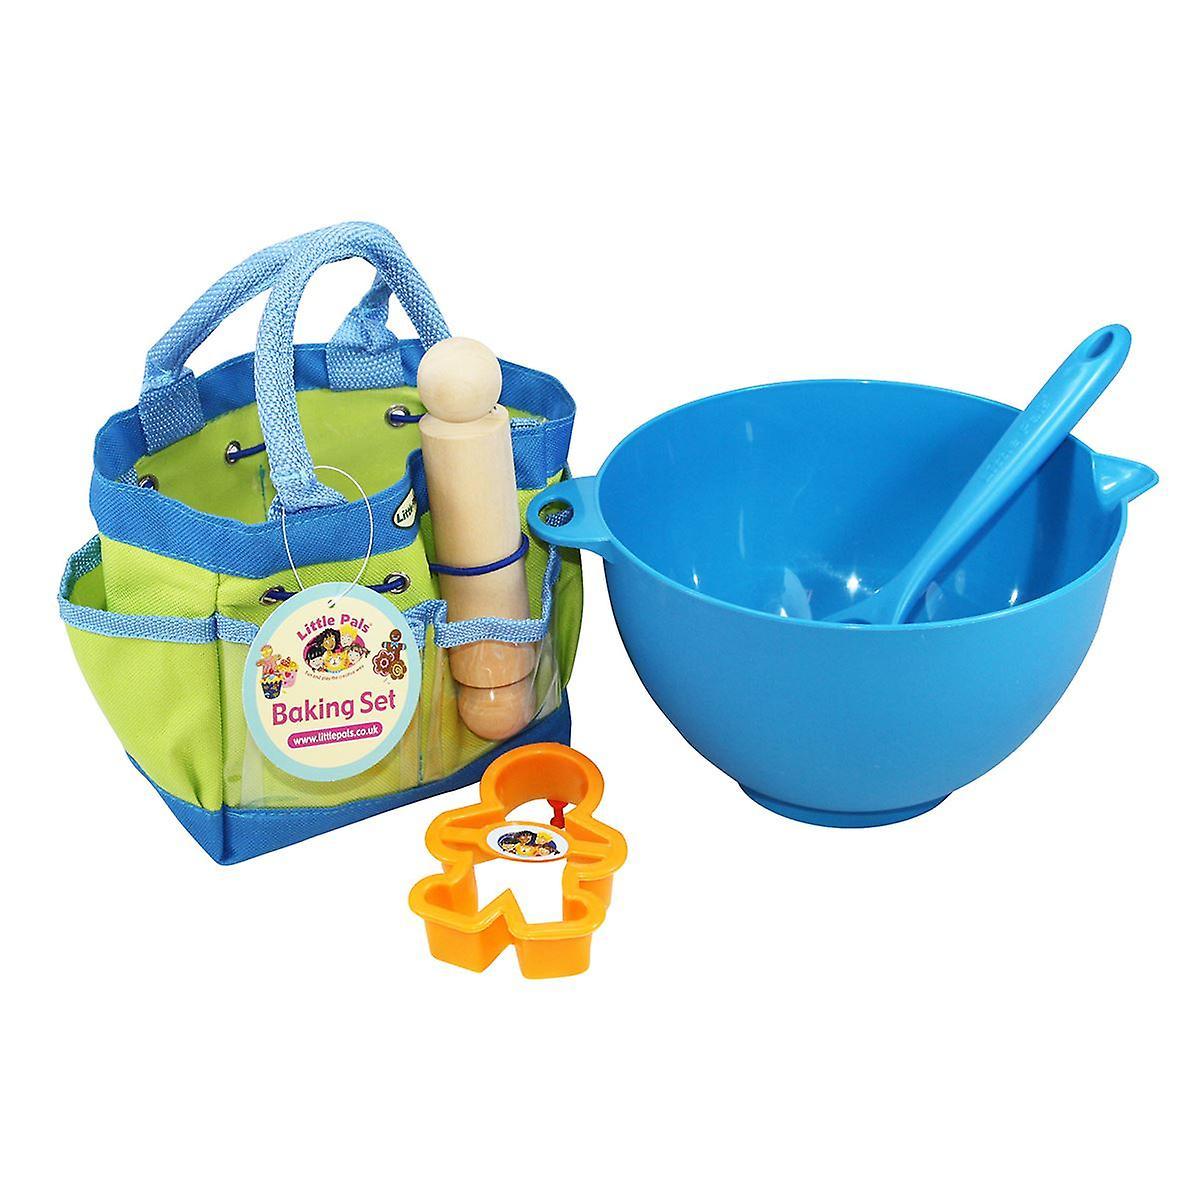 Little Pals Baking Starter Set With Bag